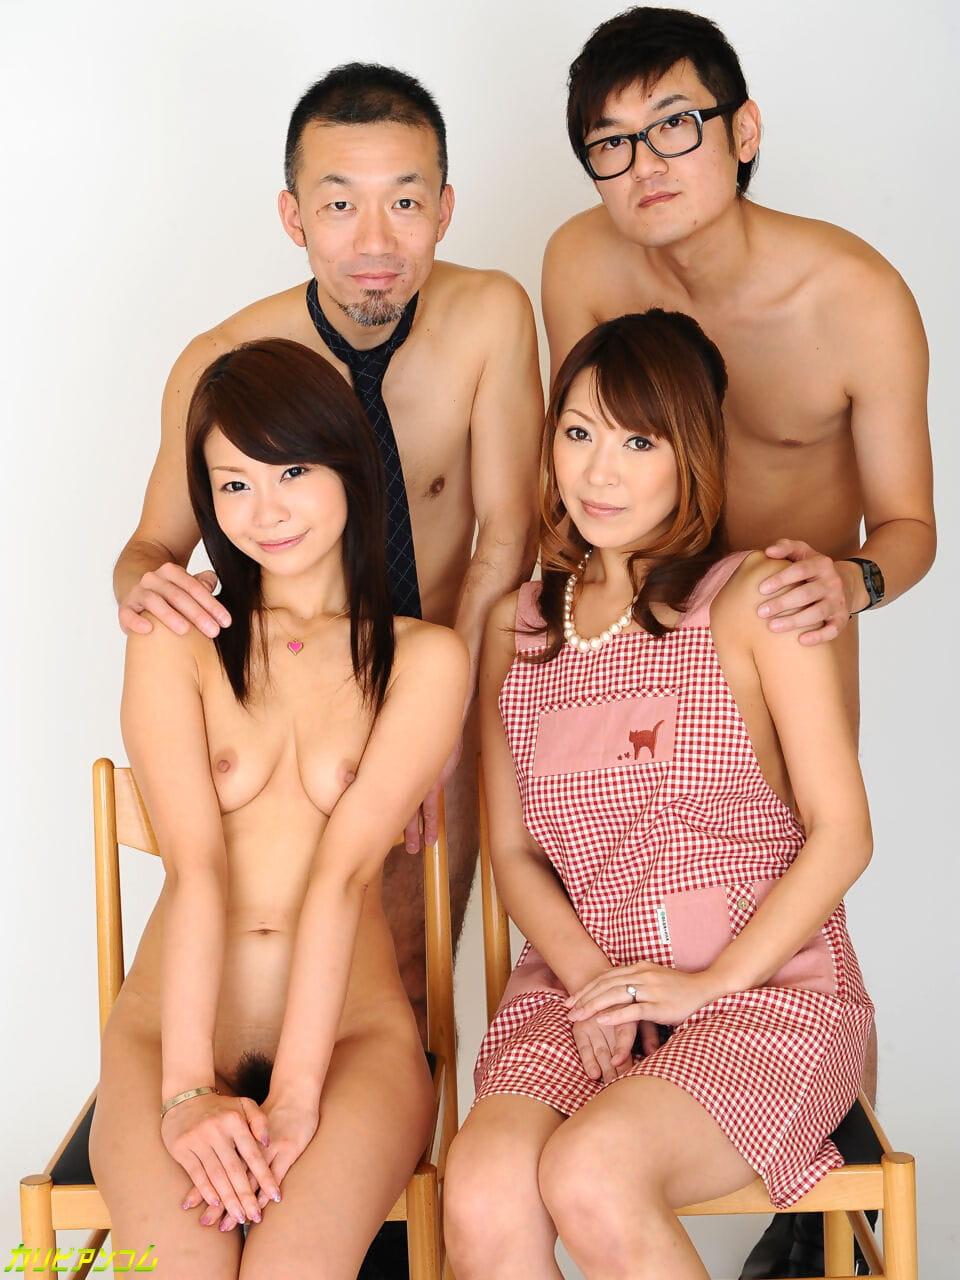 Elegant American & Japanese lasses enjoying a sexy hardcore foursome